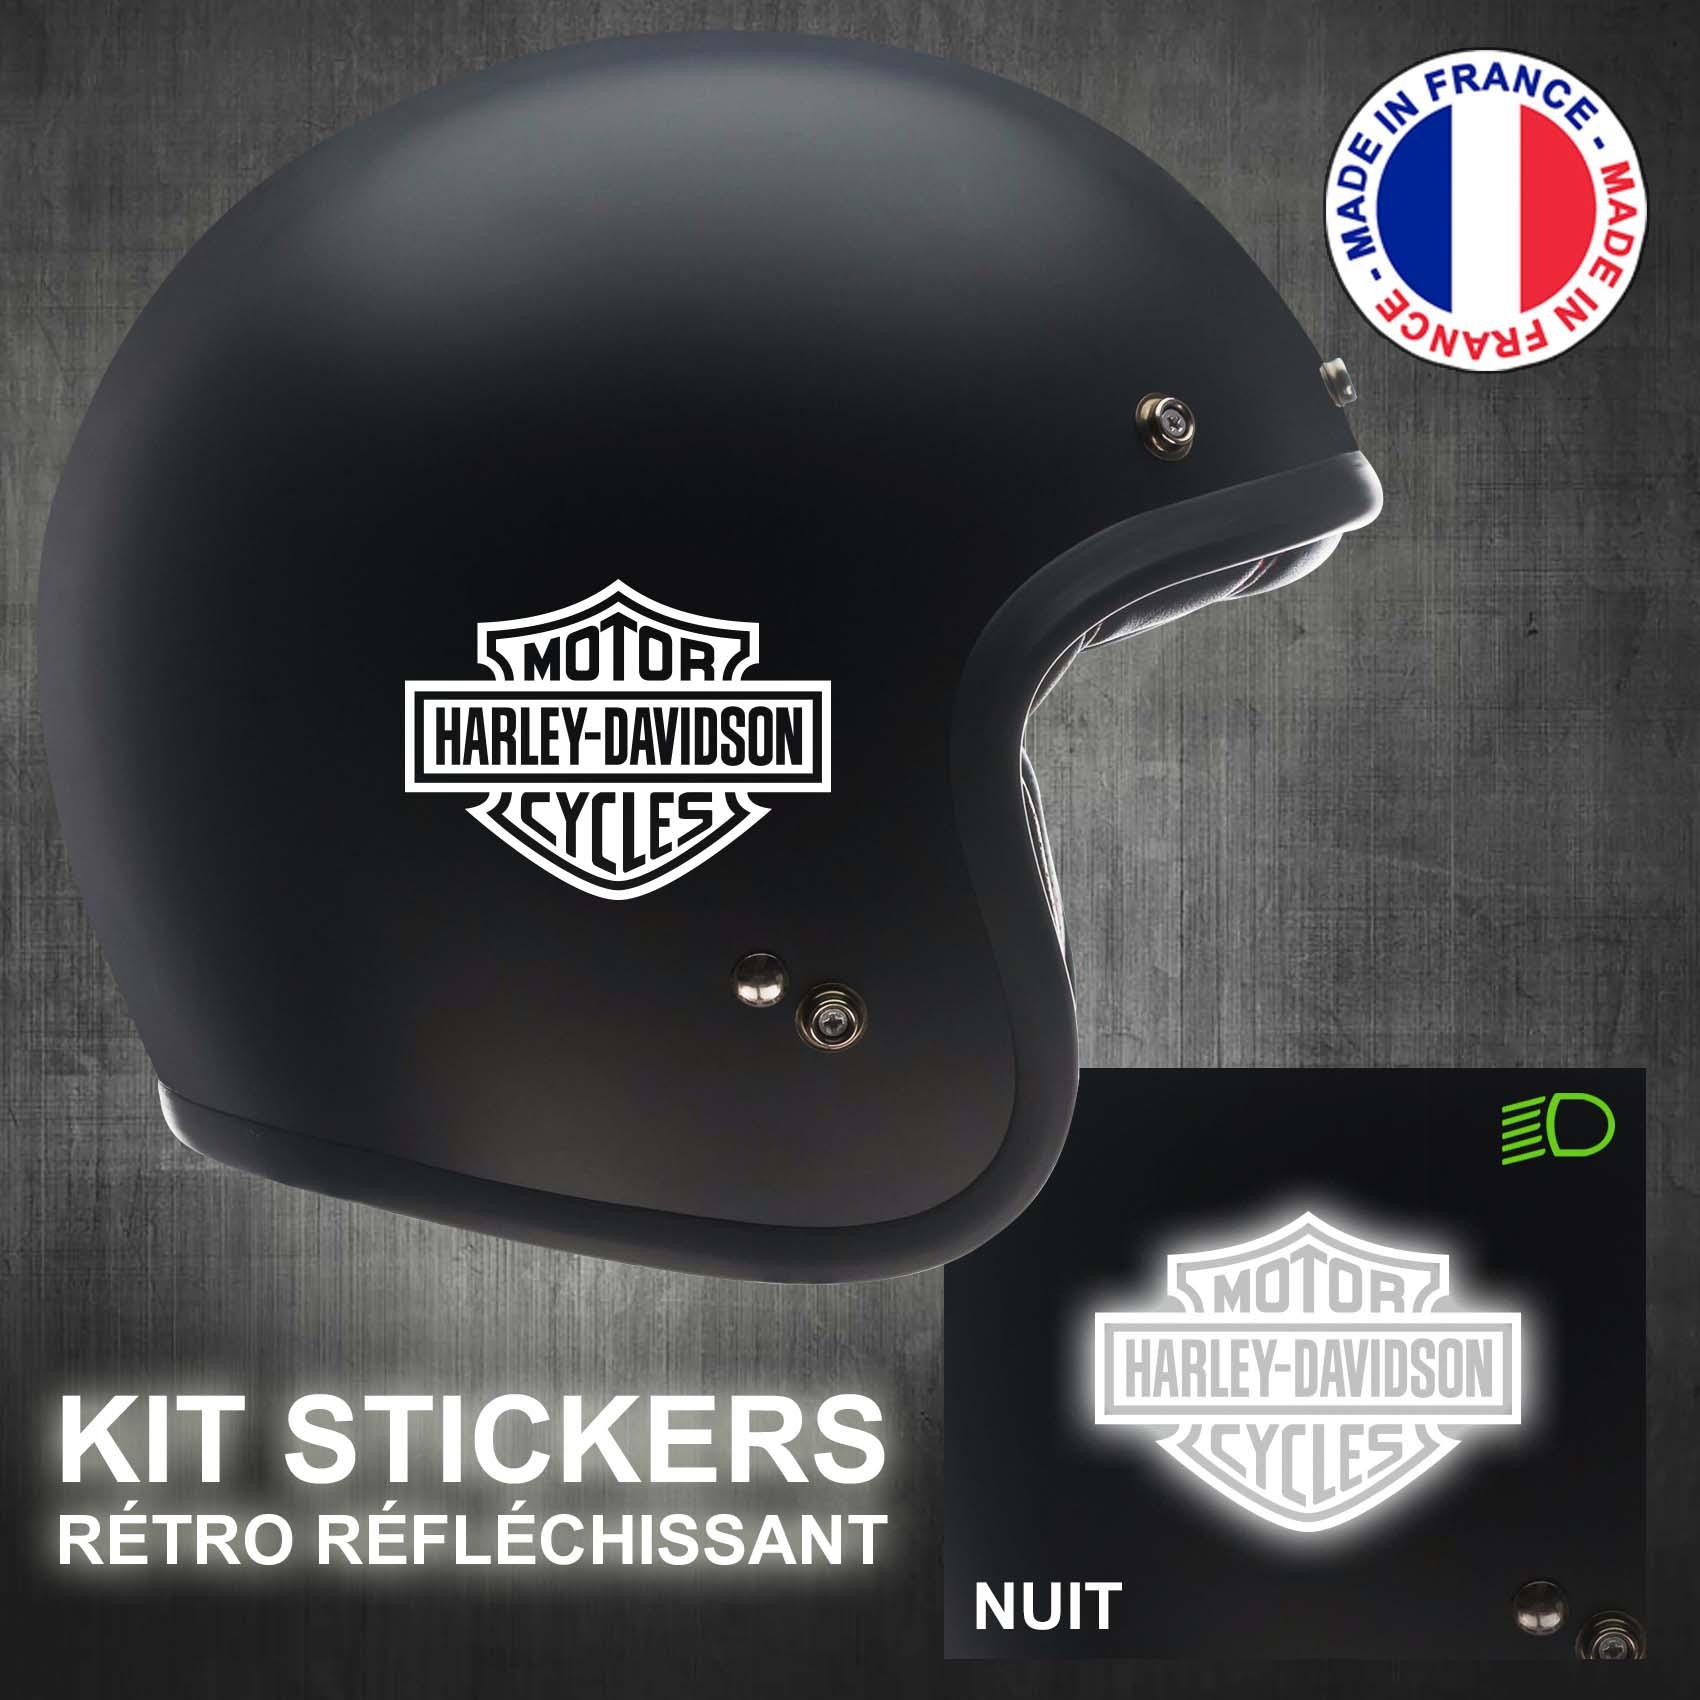 Other Motorcycle Decals Emblems Flags Motors Decal Sticker Vespa Helmet Mirror Scooter Tuning Motorbike